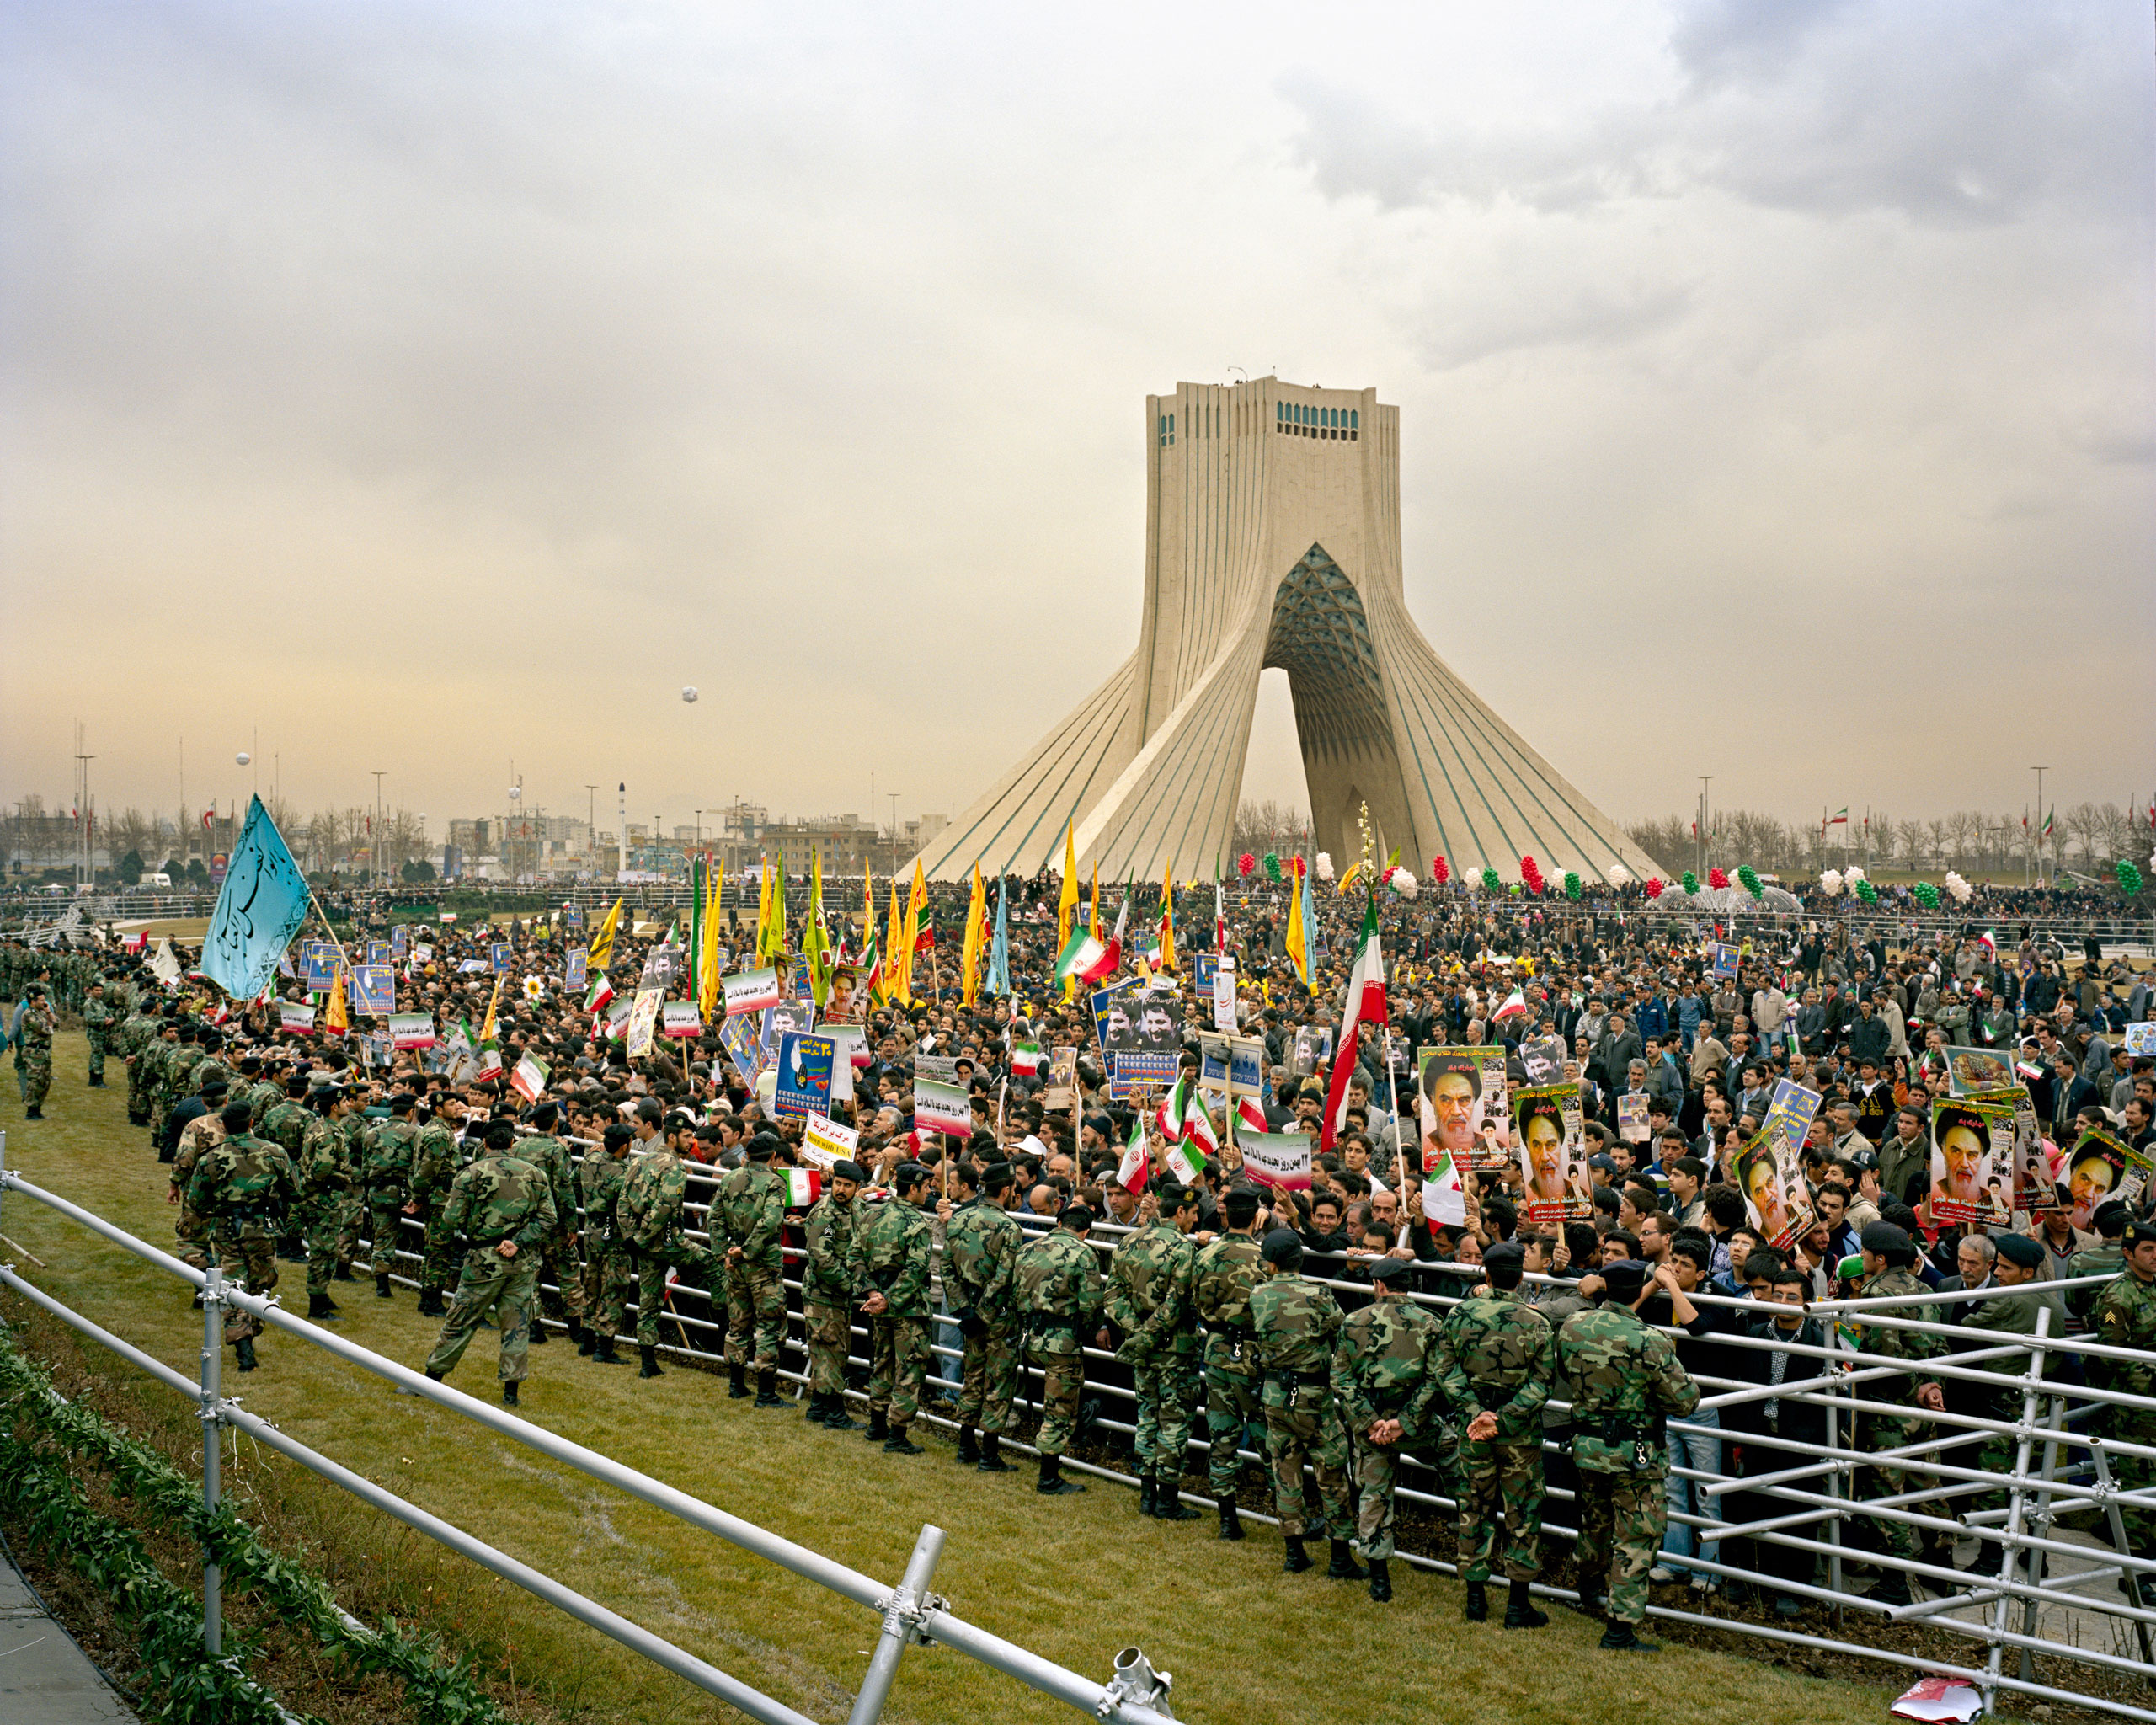 Freedom Square, 30th anniversary of Islamic Revolution, 2009Official ceremonies in Azadi Square (Freedom Square) in Tehran.